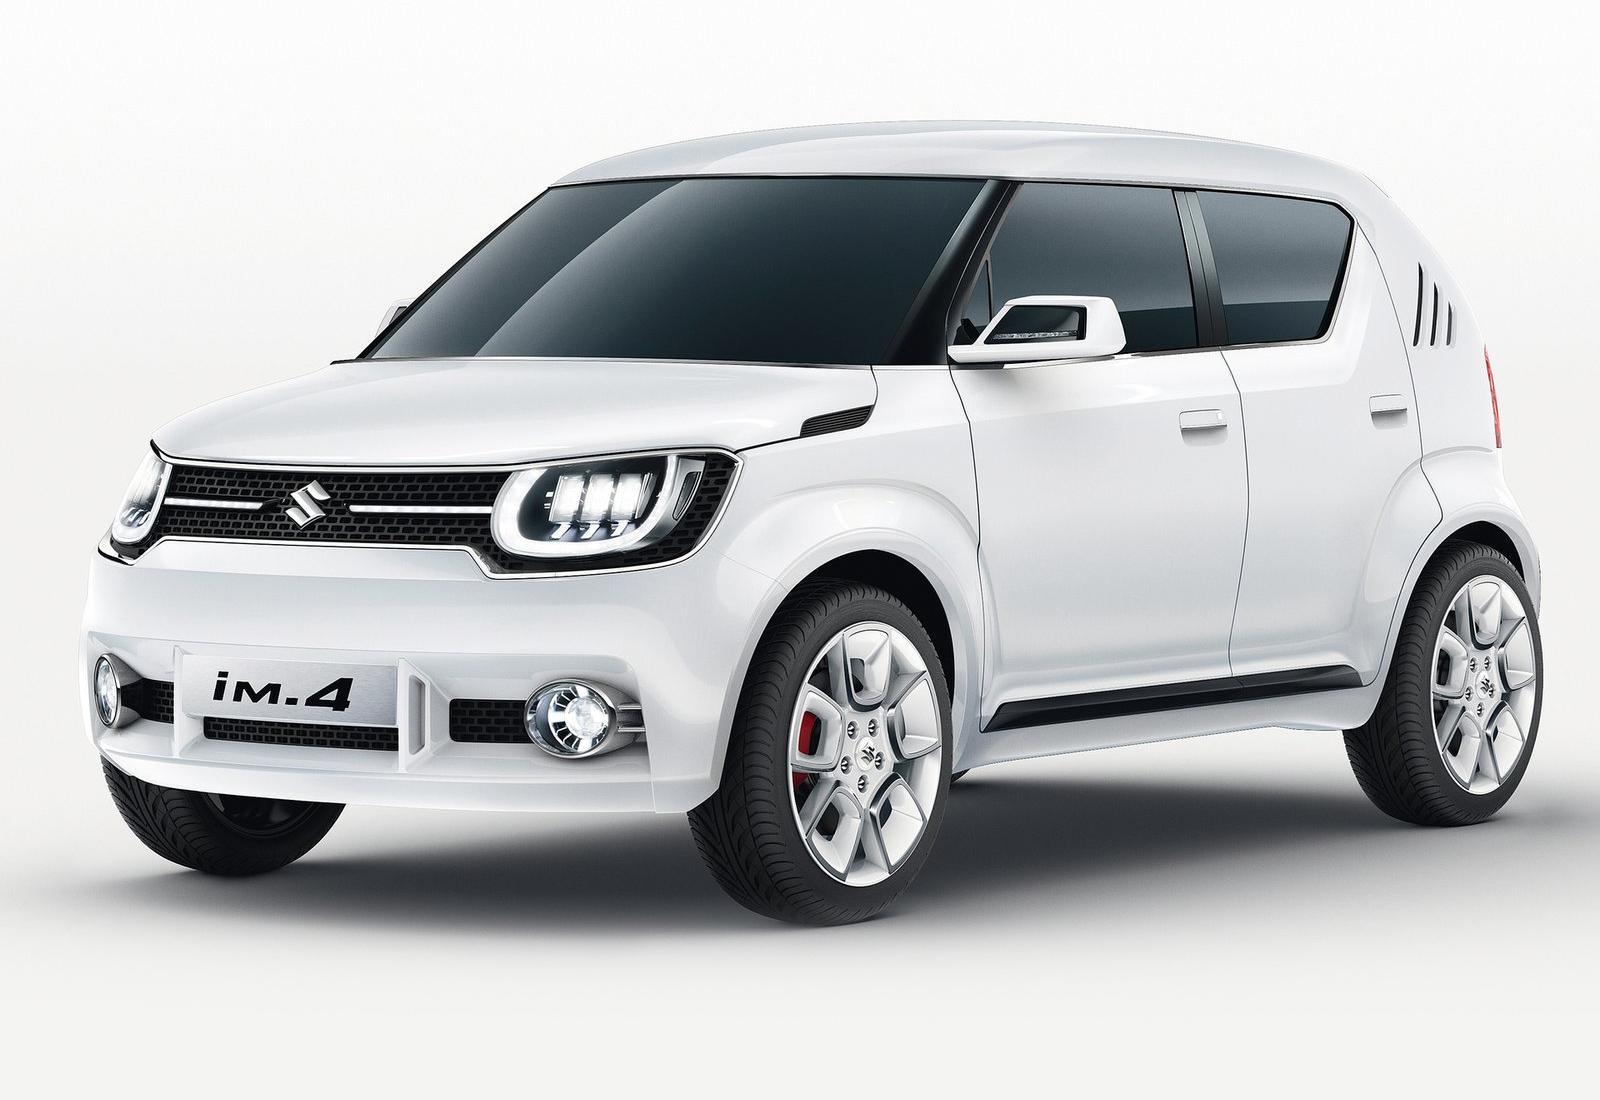 Suzuki iM-4 Isn't The New Jimny, But Both Are Coming: Report